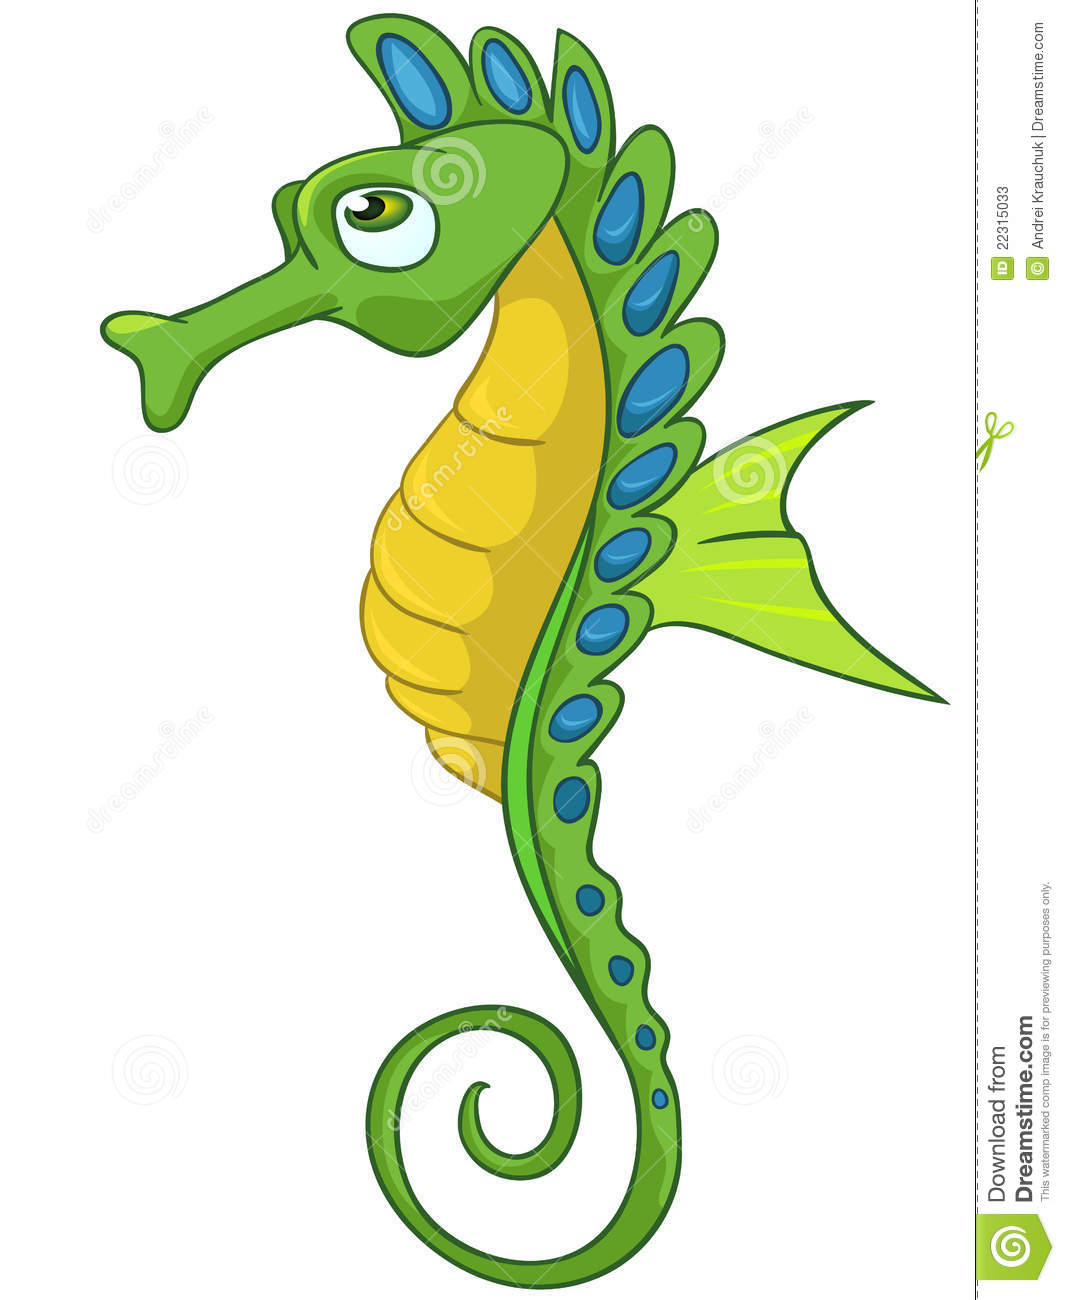 cartoon character seahorse clipart panda free clipart images rh clipartpanda com